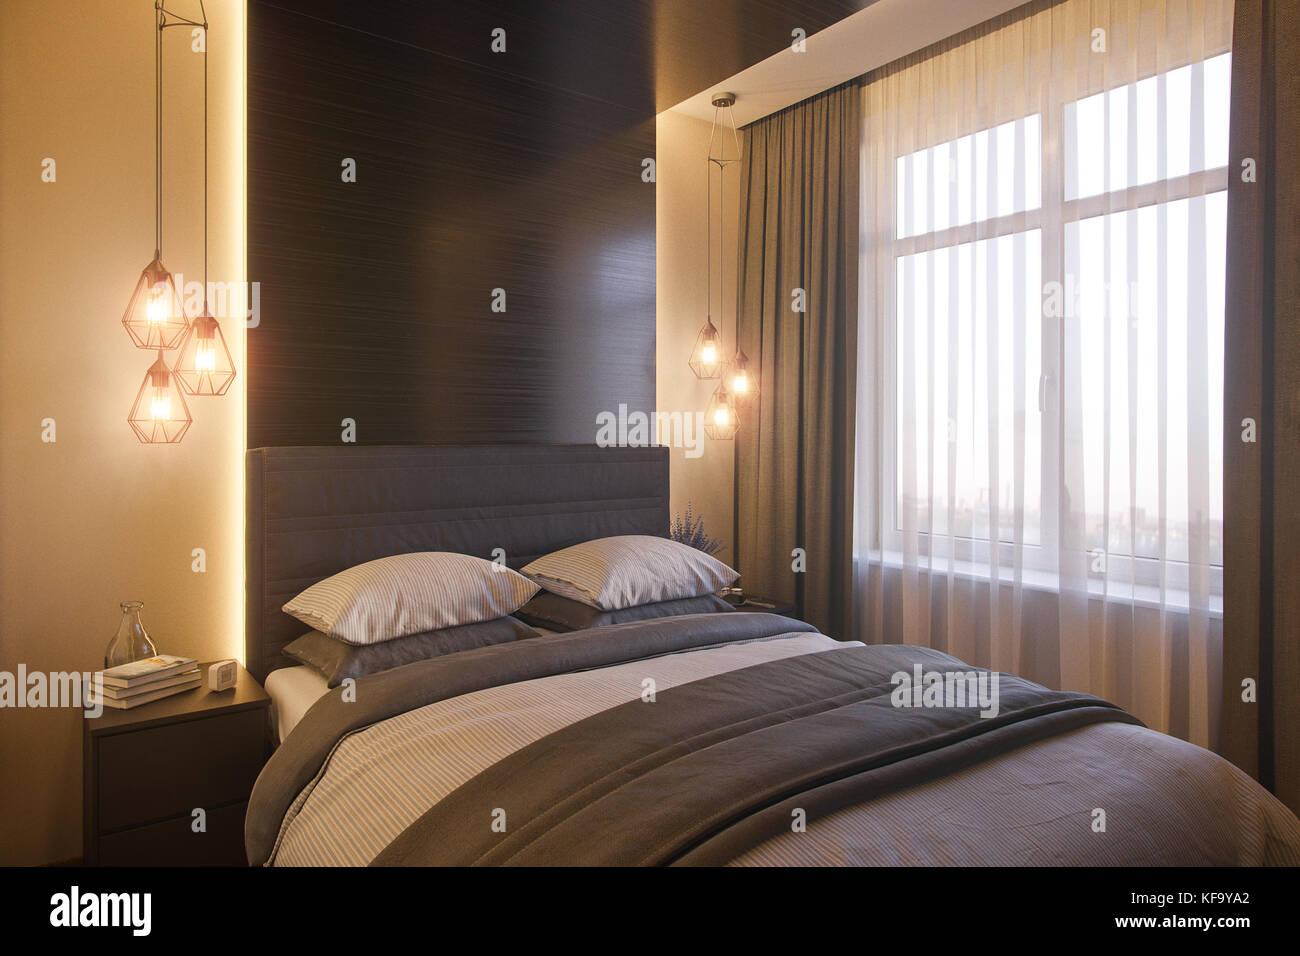 3d Illustration Of A Bedroom Interior Design In A Scandinavian Modern Stock Photo Alamy